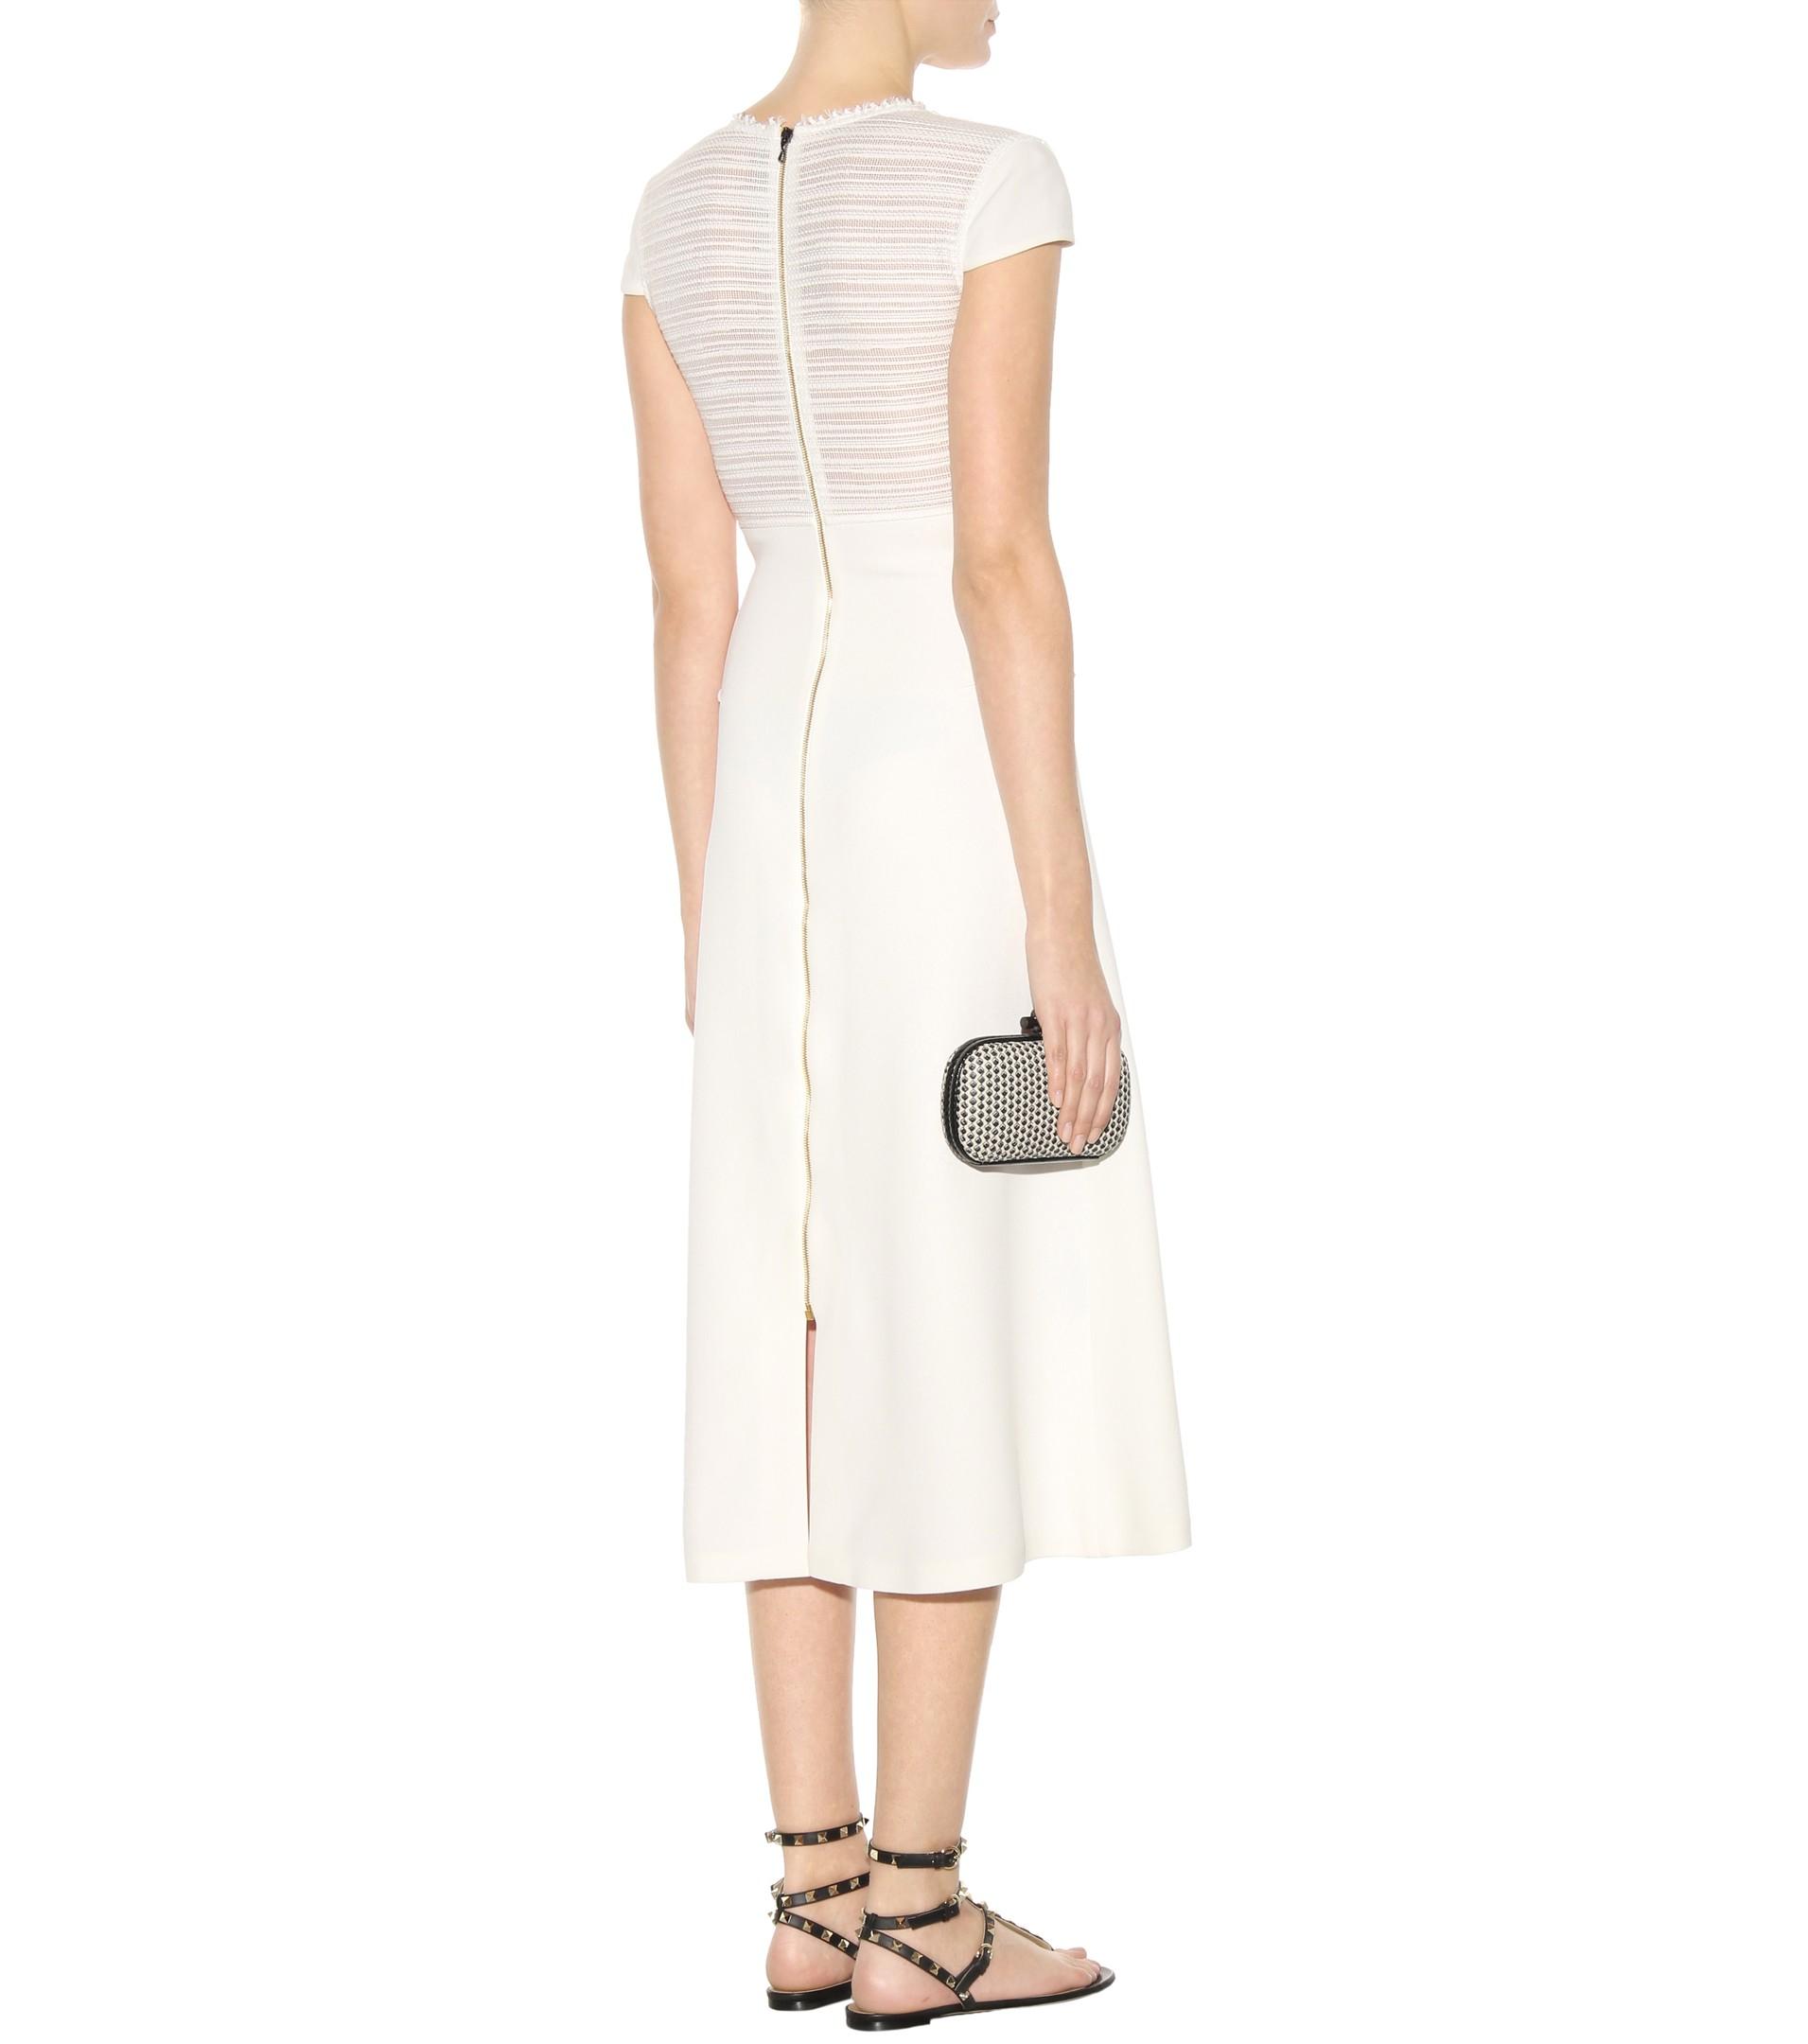 5156c92cd97 Roland Mouret Langham Crêpe Dress in White - Lyst